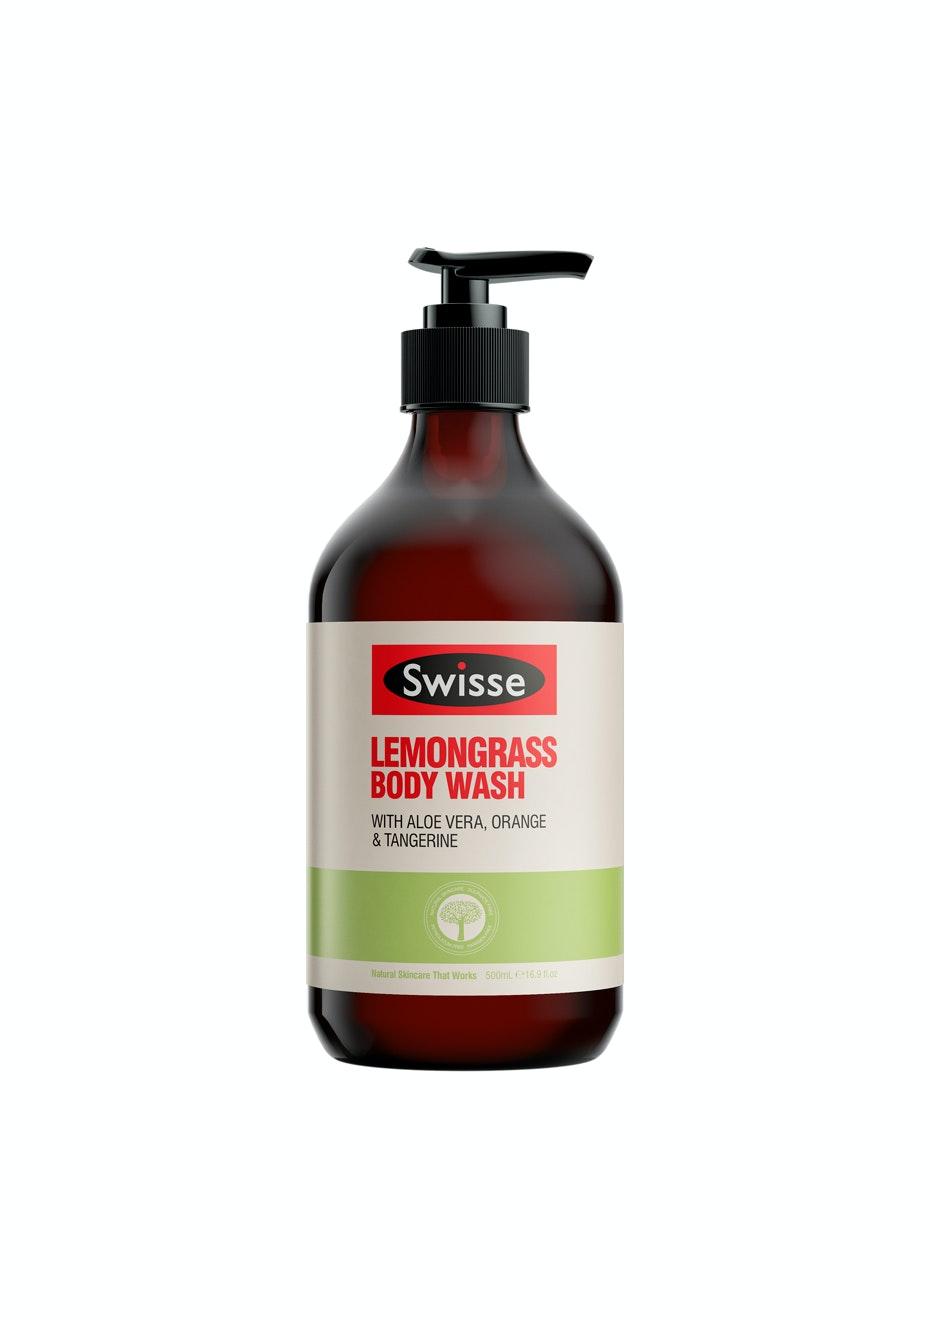 Swisse Lemongrass Bodywash 500Ml